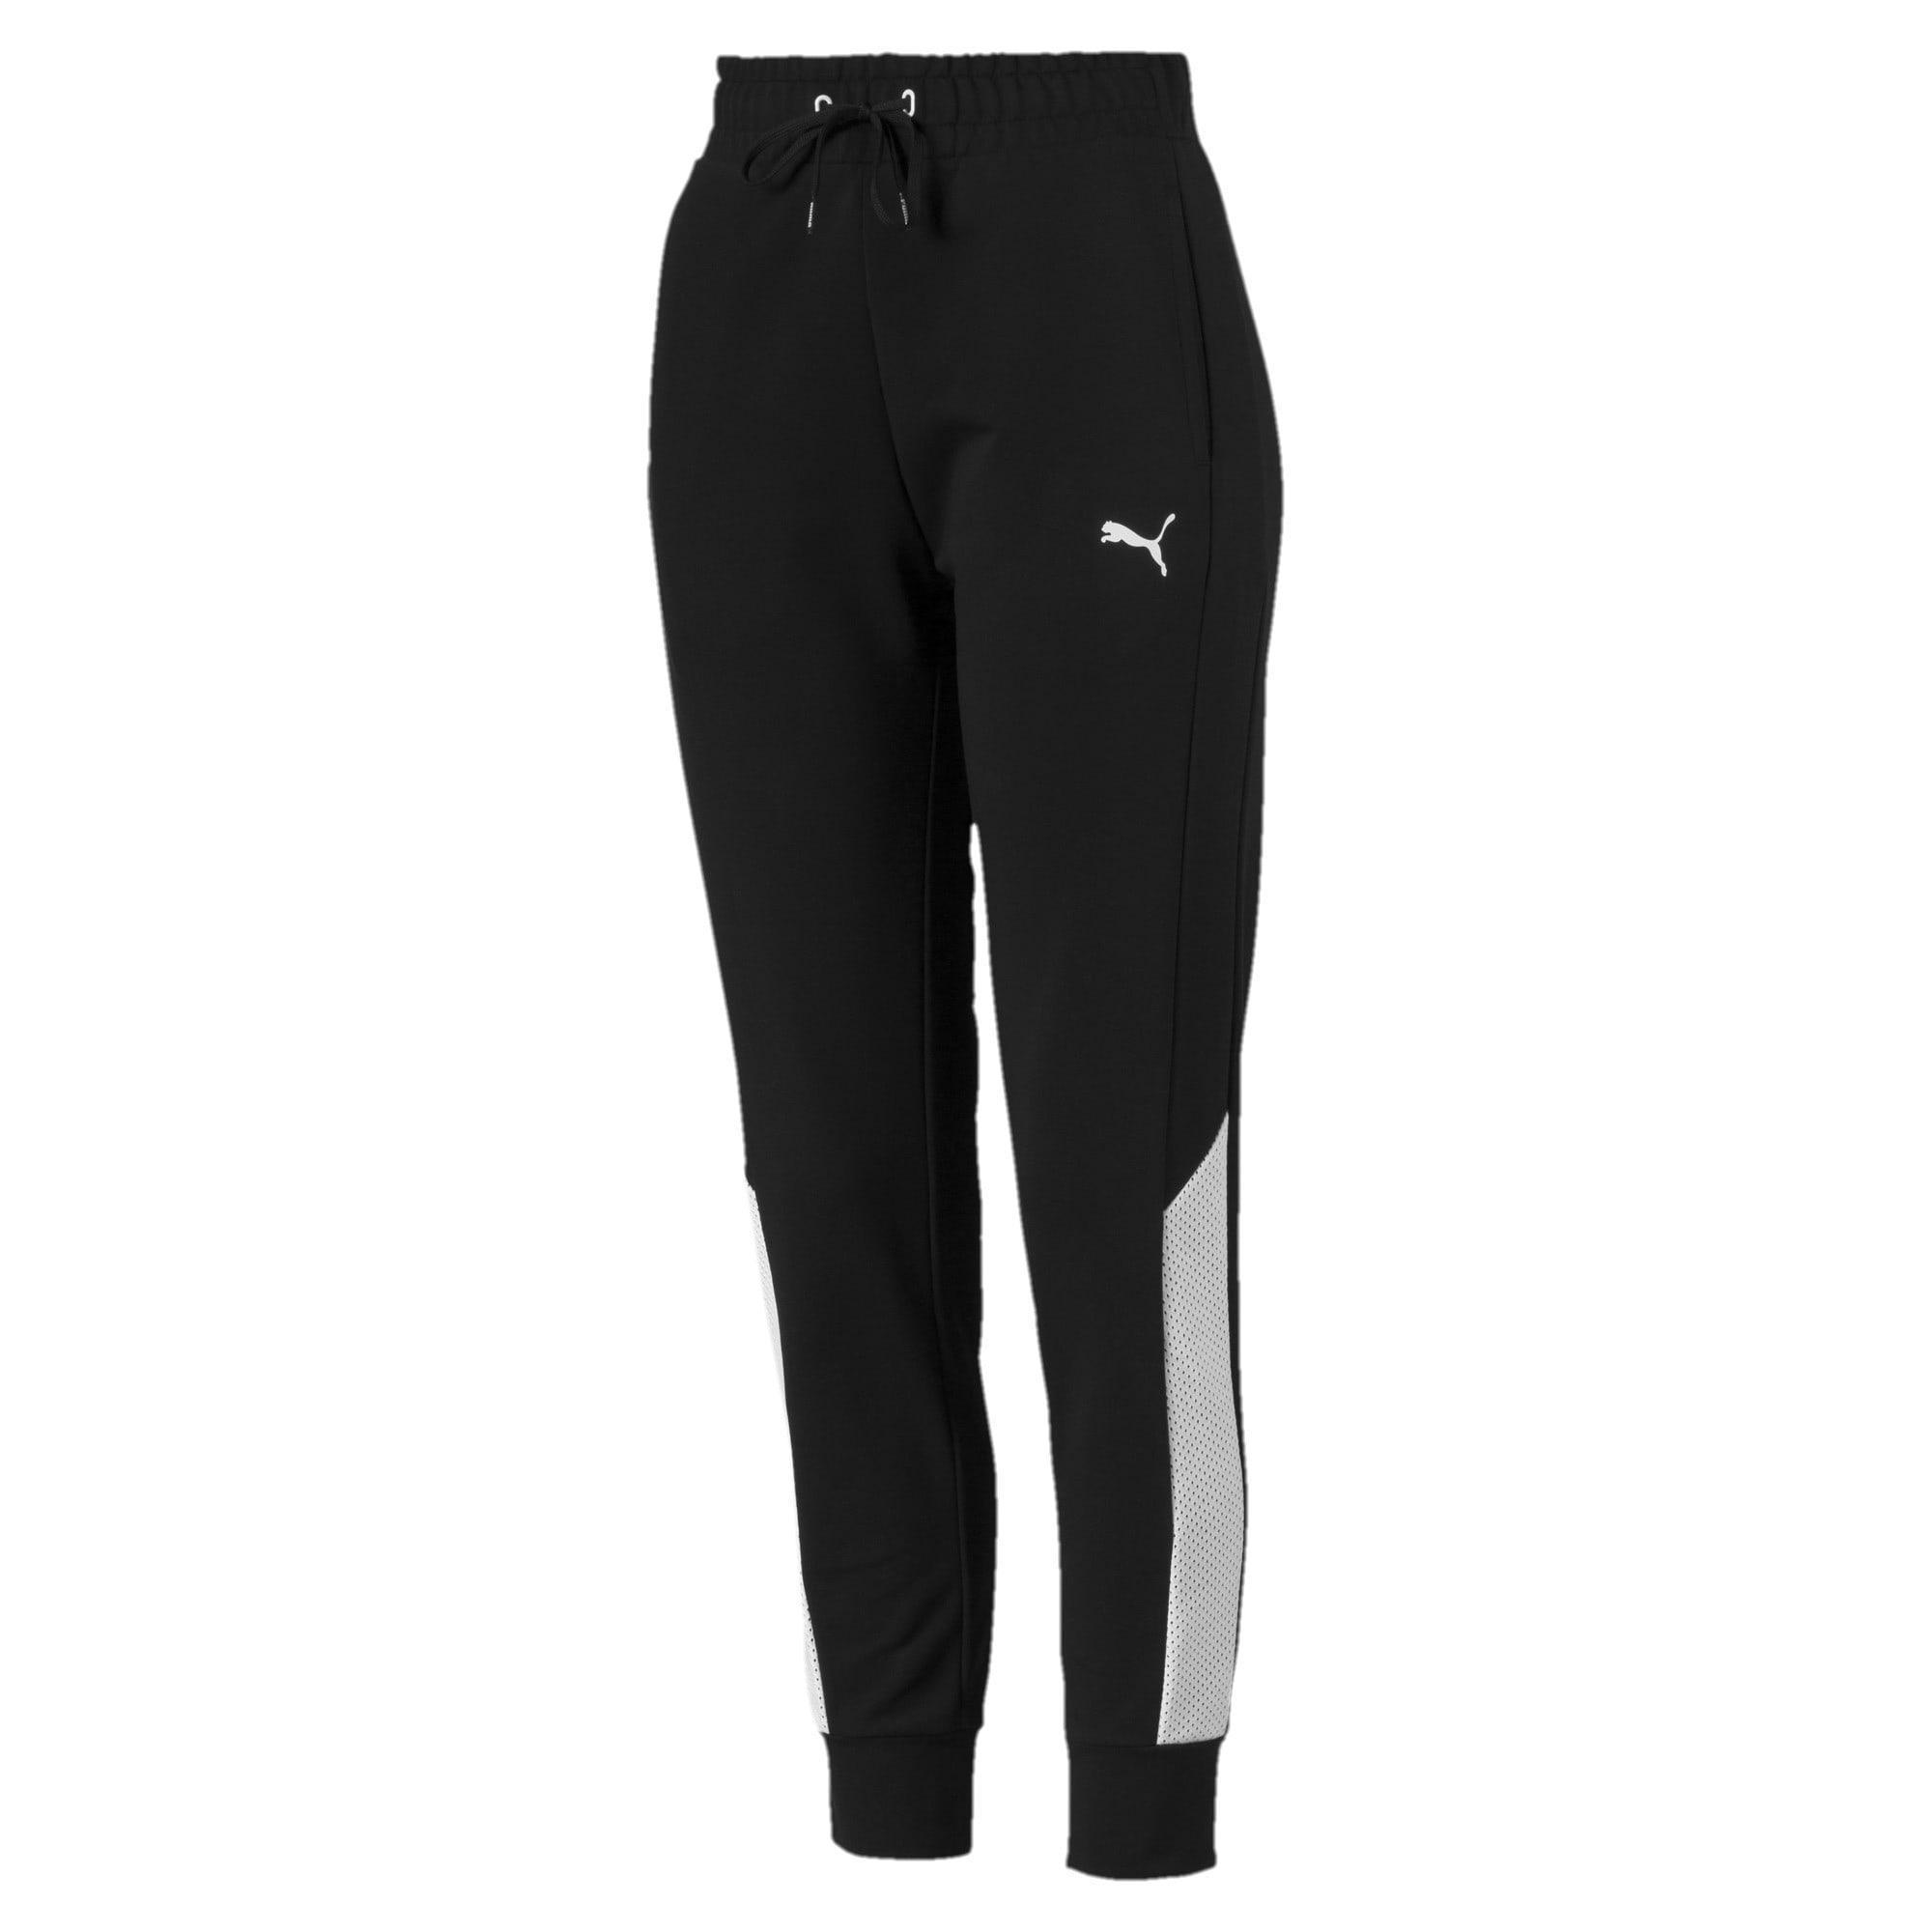 Thumbnail 4 of Modern Sports Pants, Cotton Black, medium